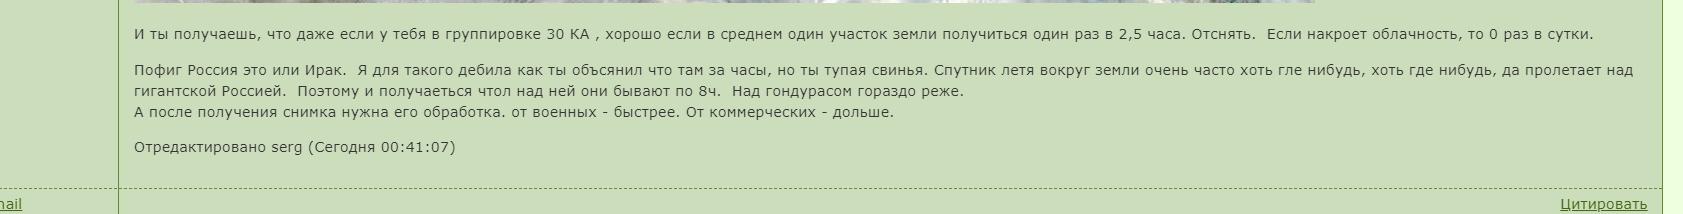 https://images.vfl.ru/ii/1579940897/8e049ed2/29317264.png